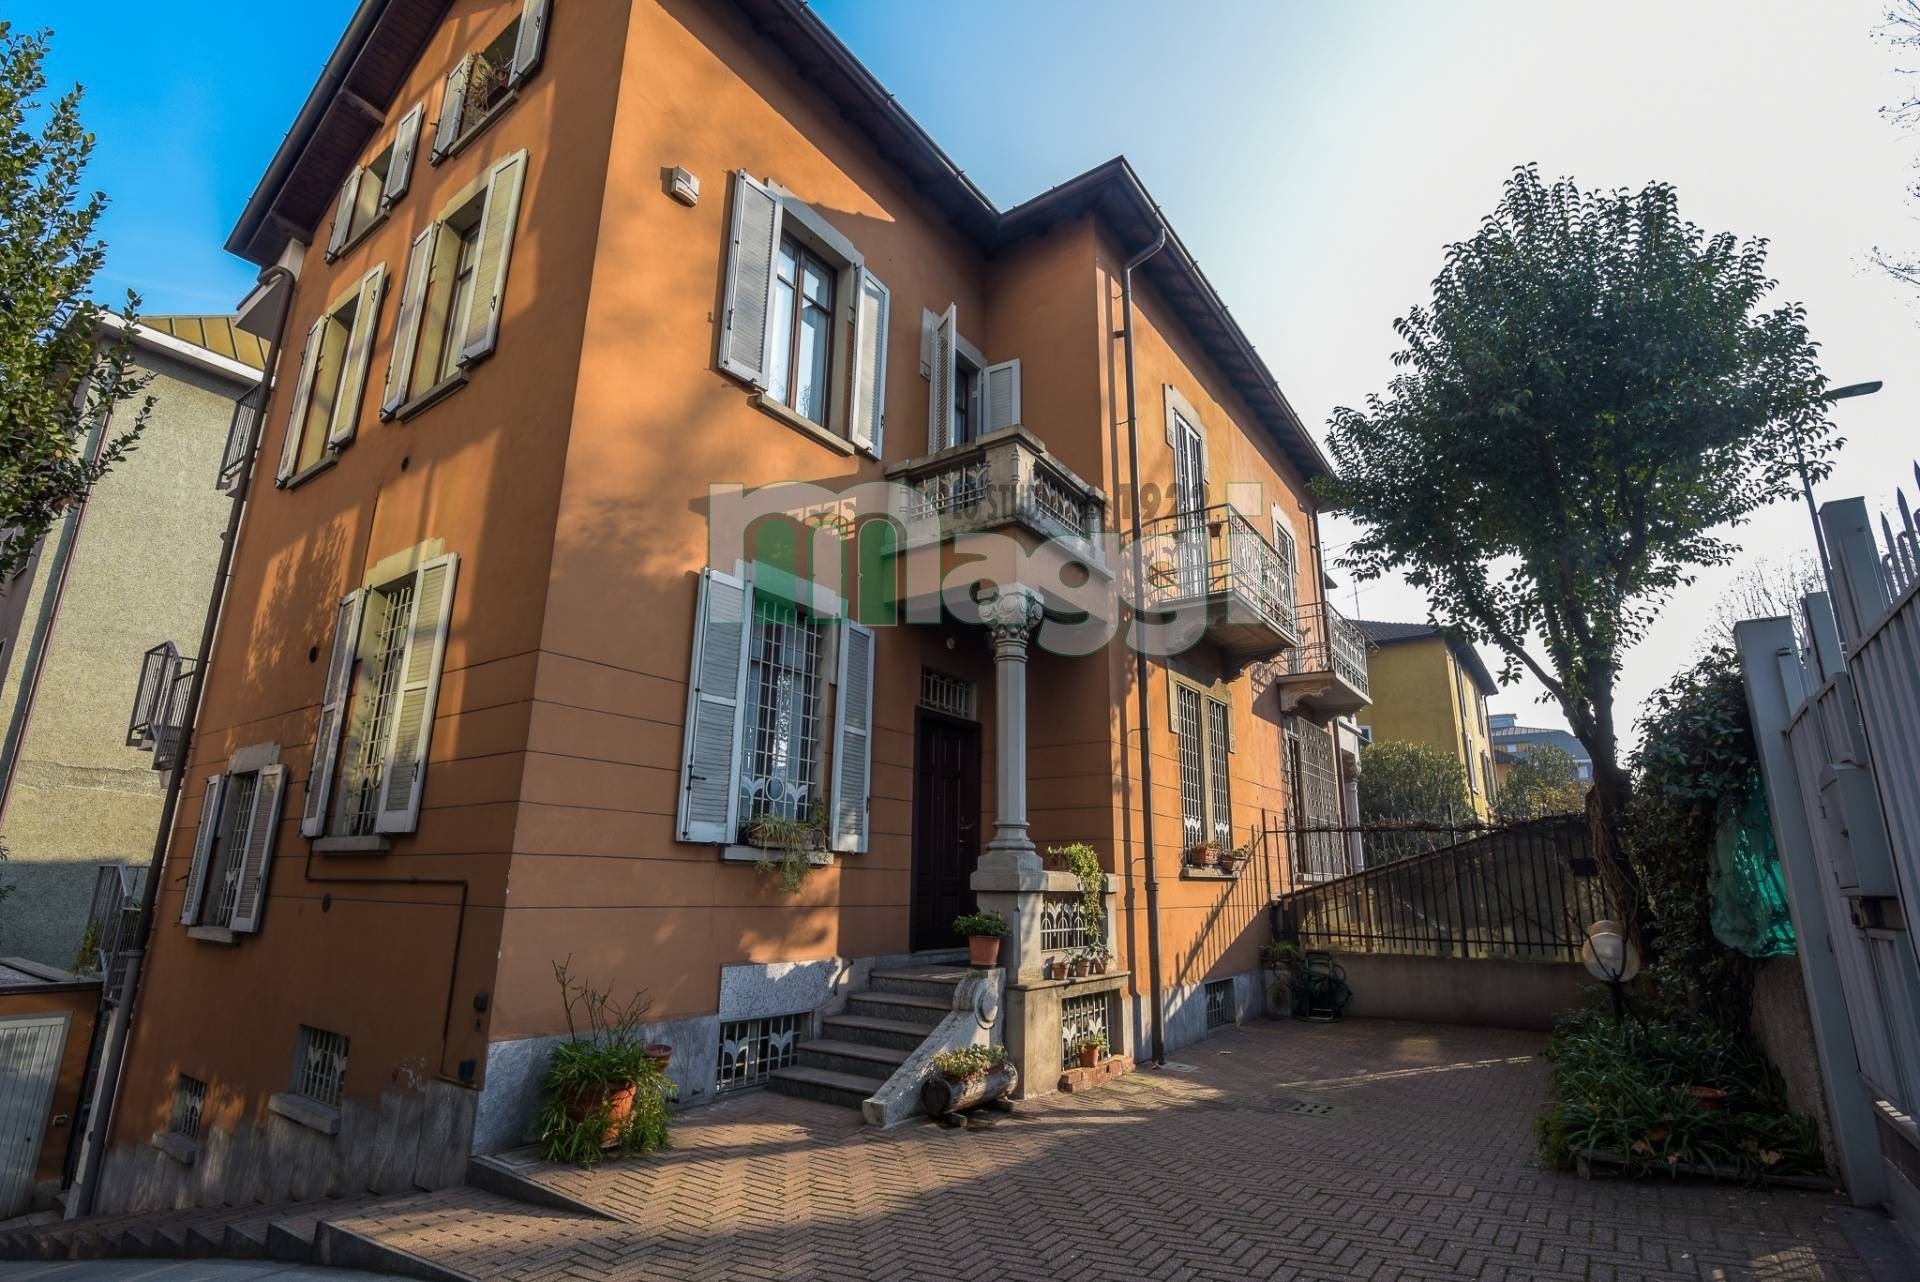 Milano   Villa in Vendita in Viale Lunigiana   lacasadimilano.it